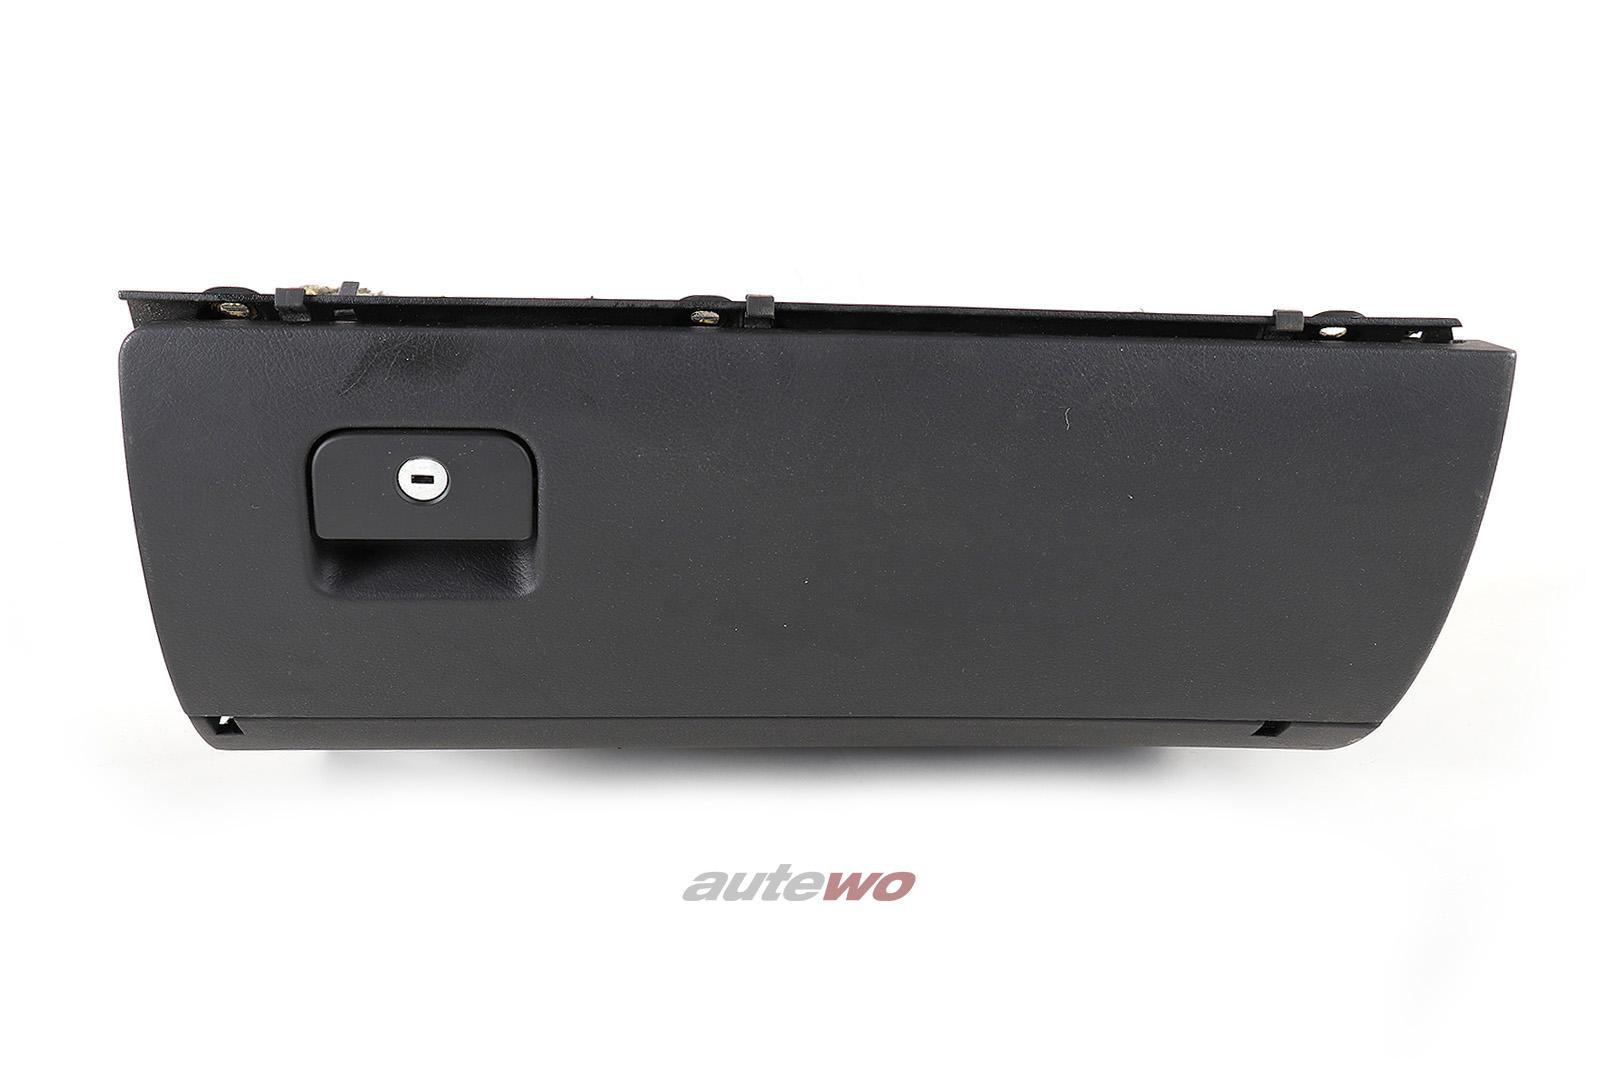 4B1857035AD 4Z7857035 Audi A6/S6/RS6/Allroad 4B Handschuhfach 6PS soul schwarz